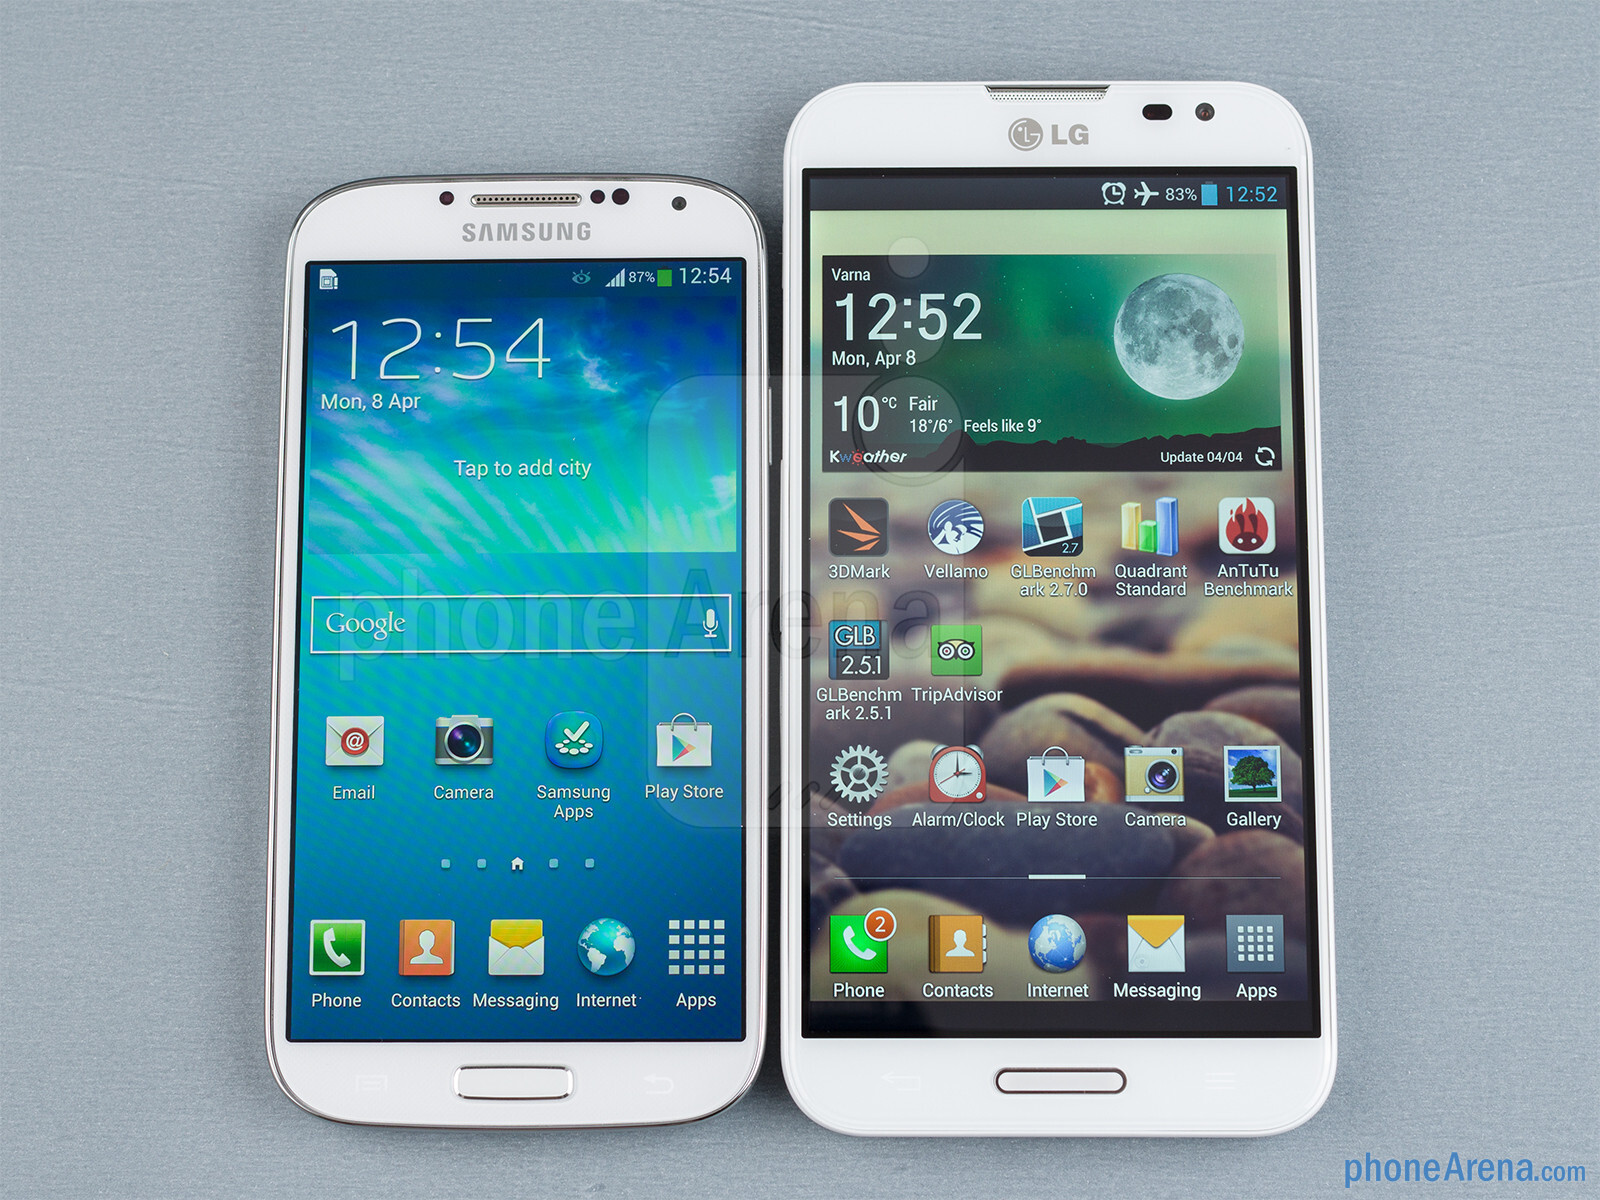 samsung galaxy s4 vs lg optimus g pro rh phonearena com LG Optimus G Pro Driver LG Optimus G Pro Driver